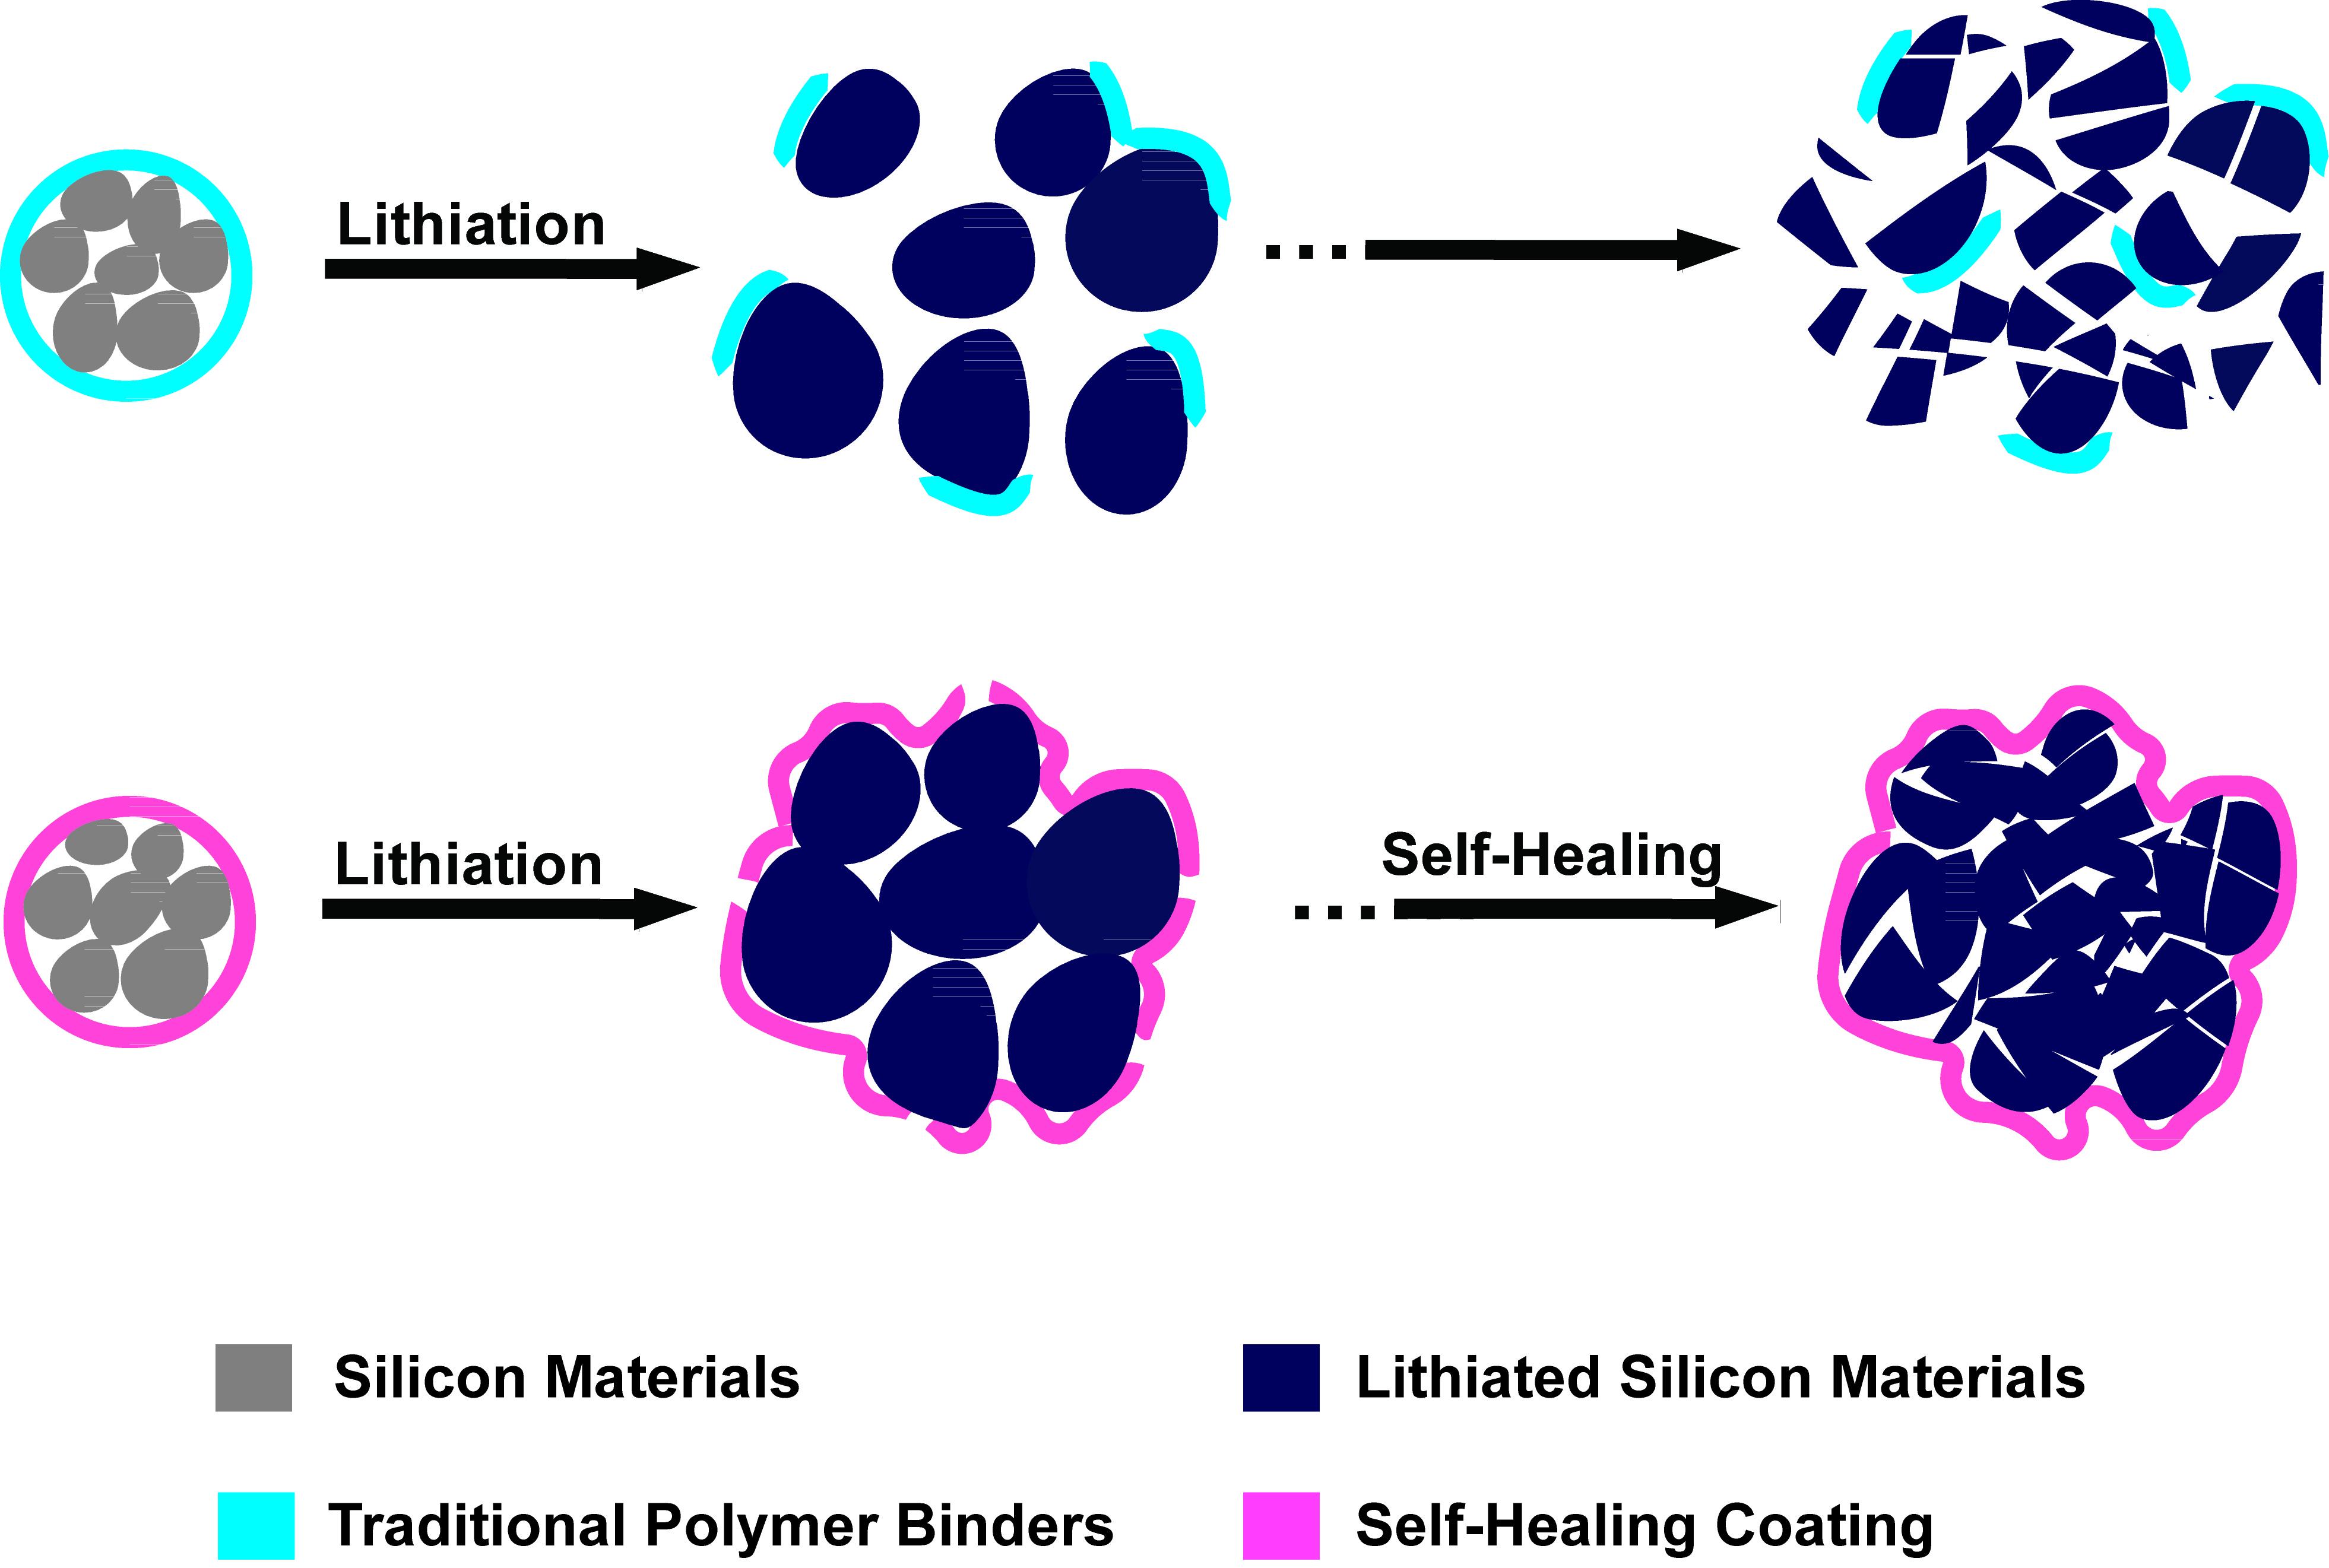 Batterie al litio autoriparanti via Gizmodo